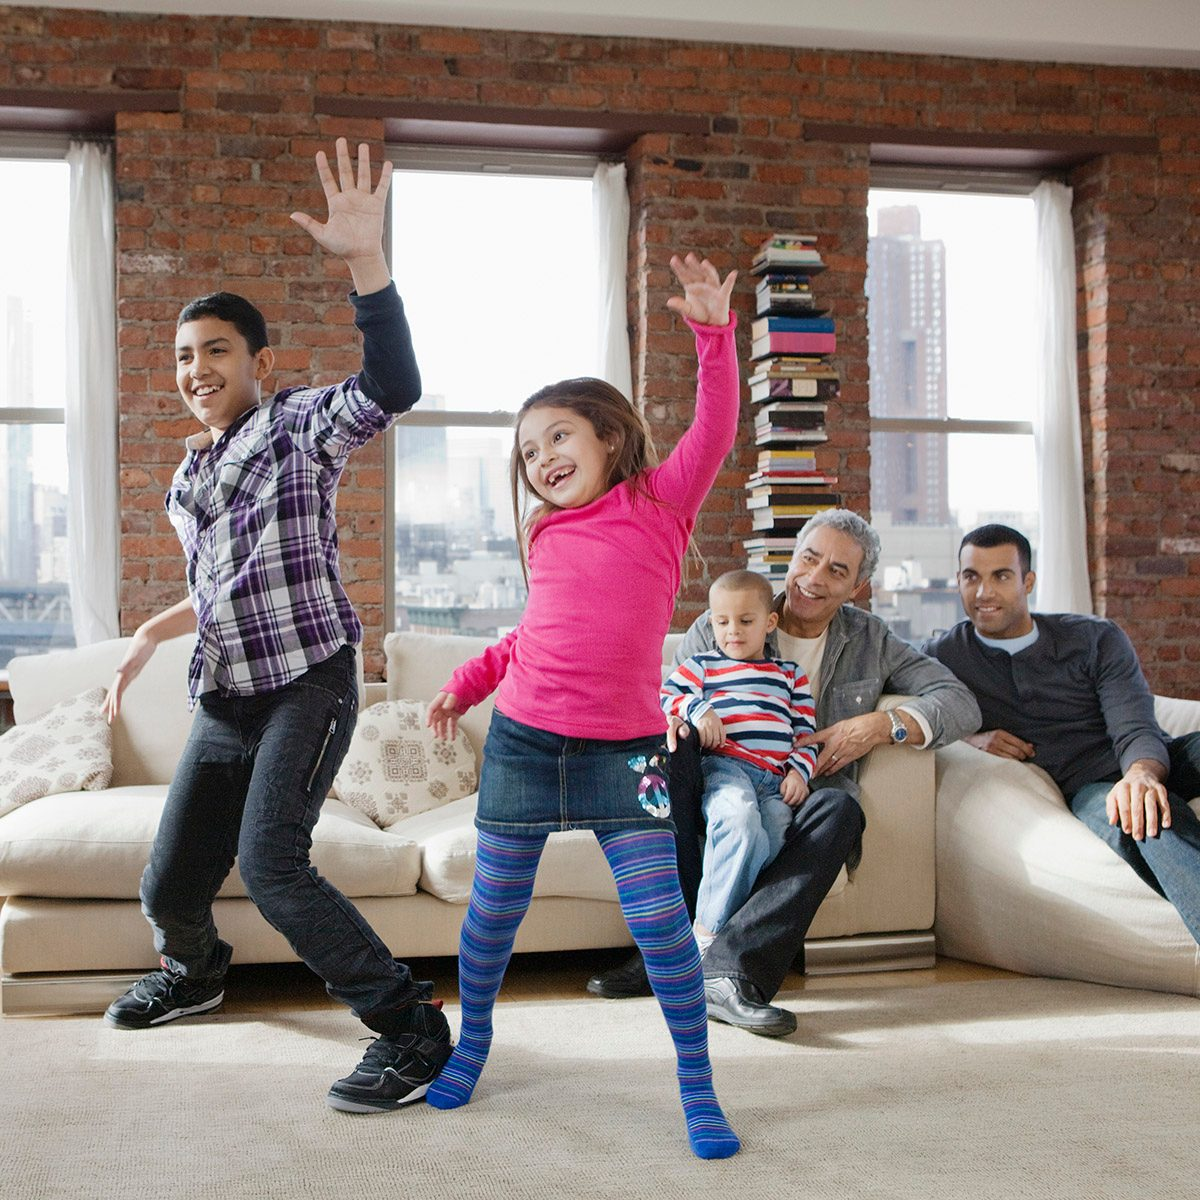 Children playing dance video game